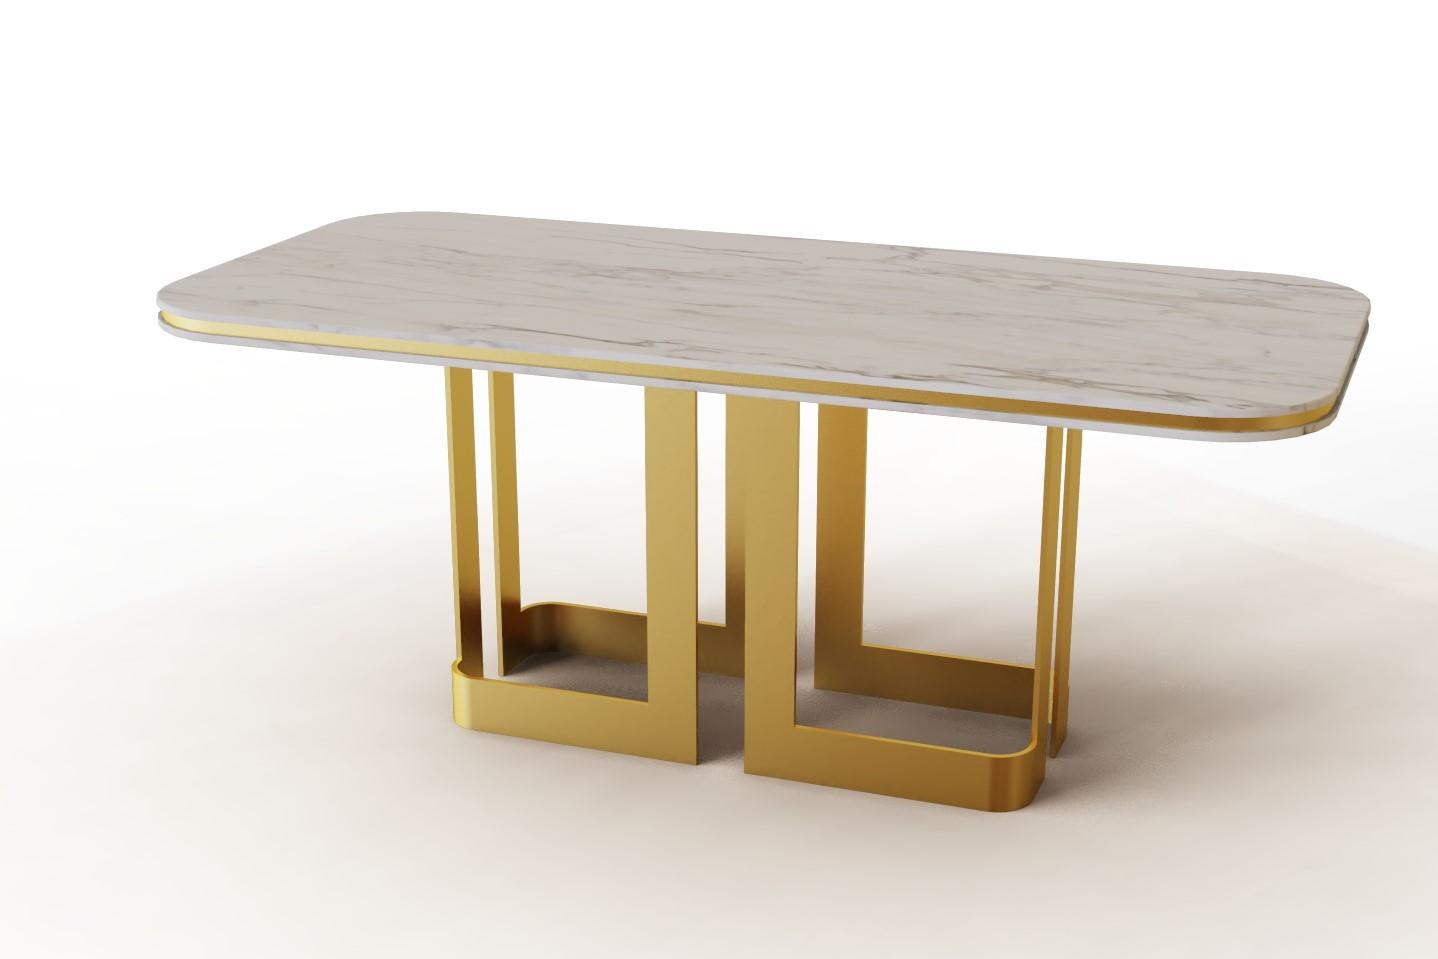 TABLE_3_2.jpg